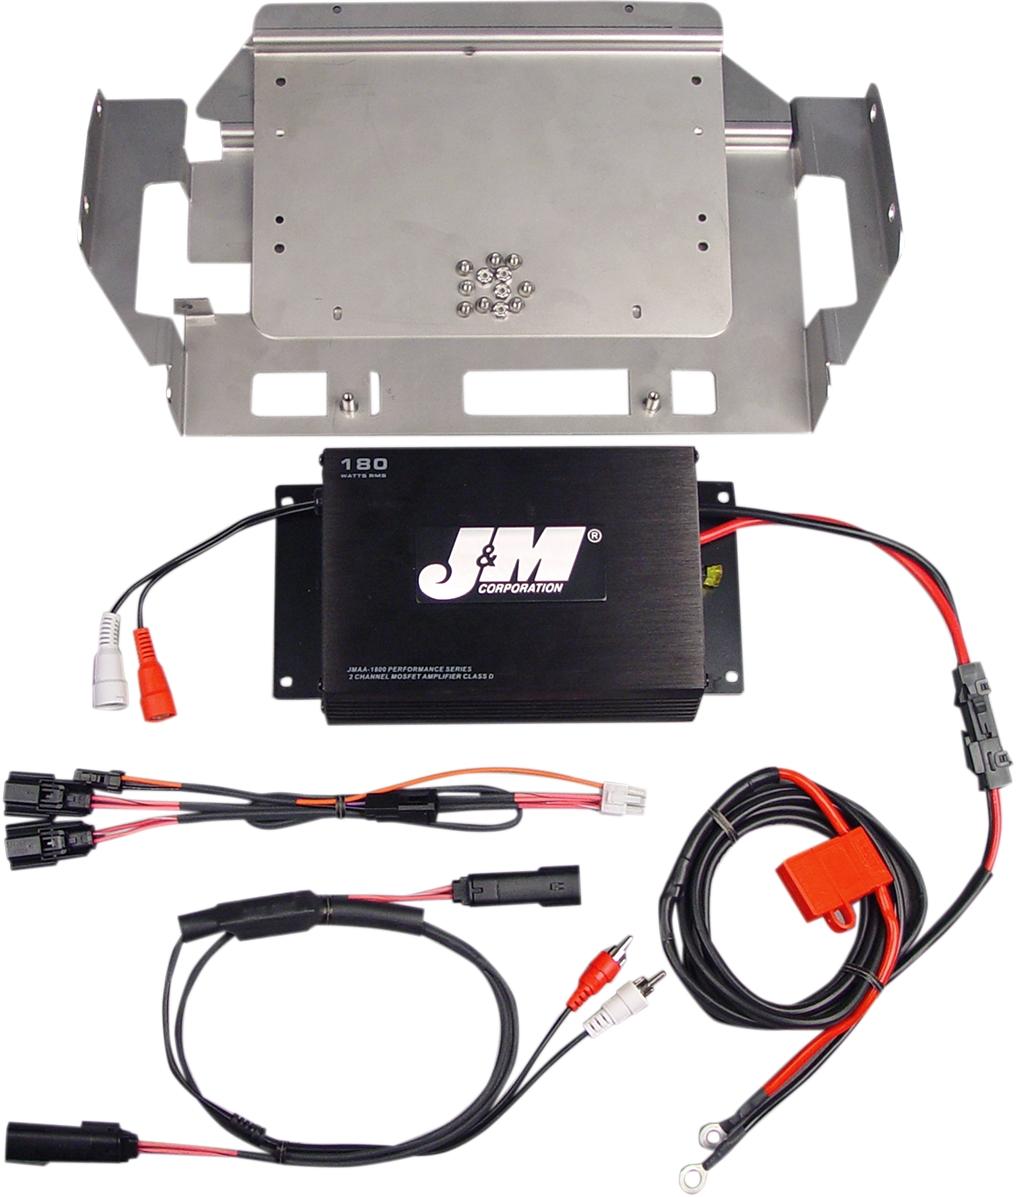 J & M Performance Series 180W Two-Channel Amplifier Kit